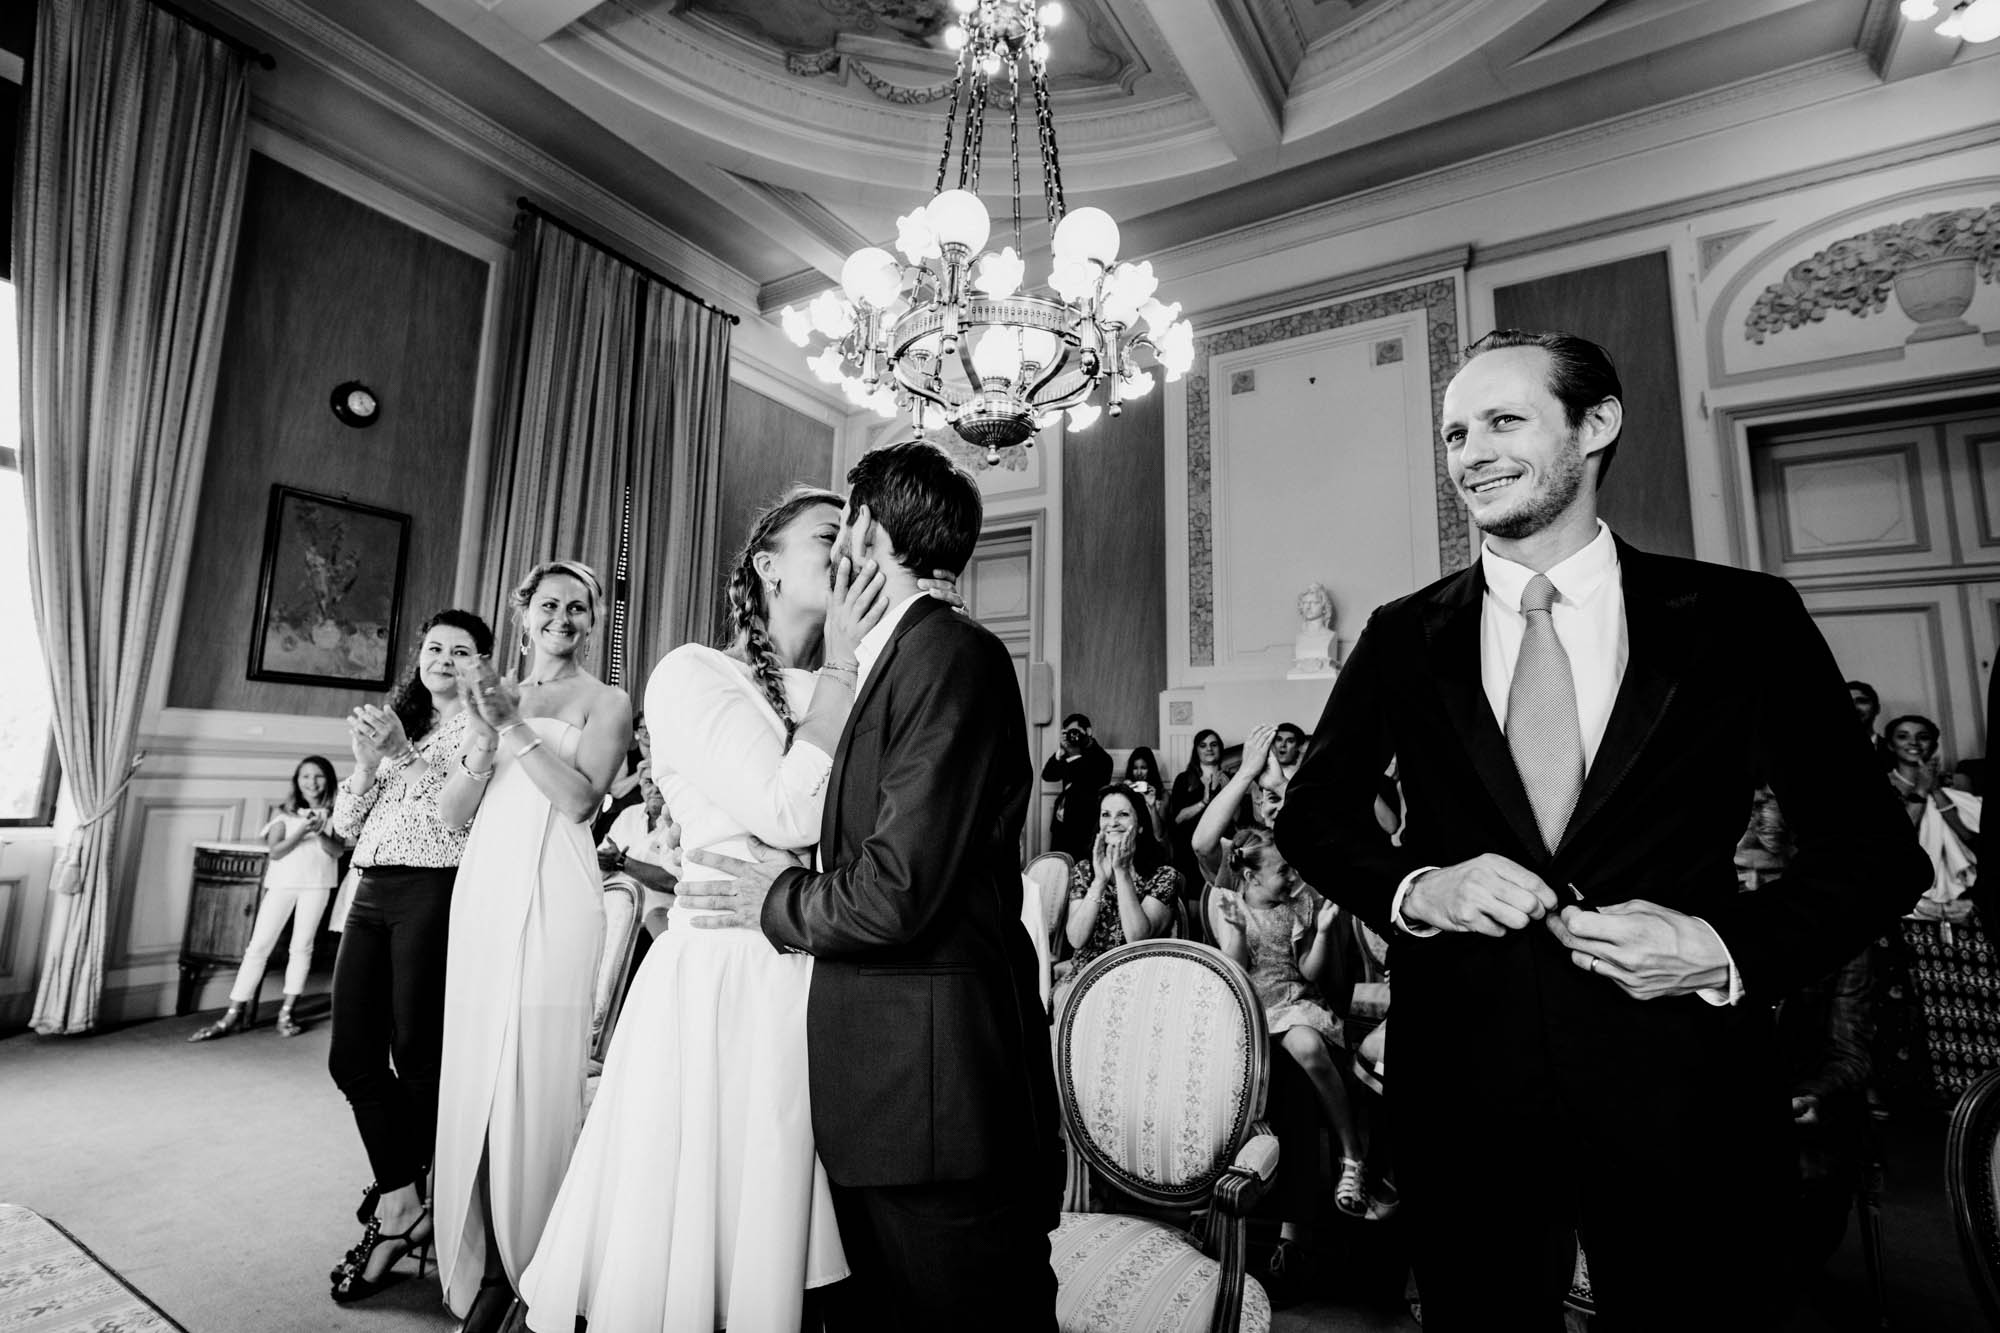 2018-07-21 - LD8_8893 - photographe mariage lyon - laurie diaz - www.lauriediazweeding.com.jpg